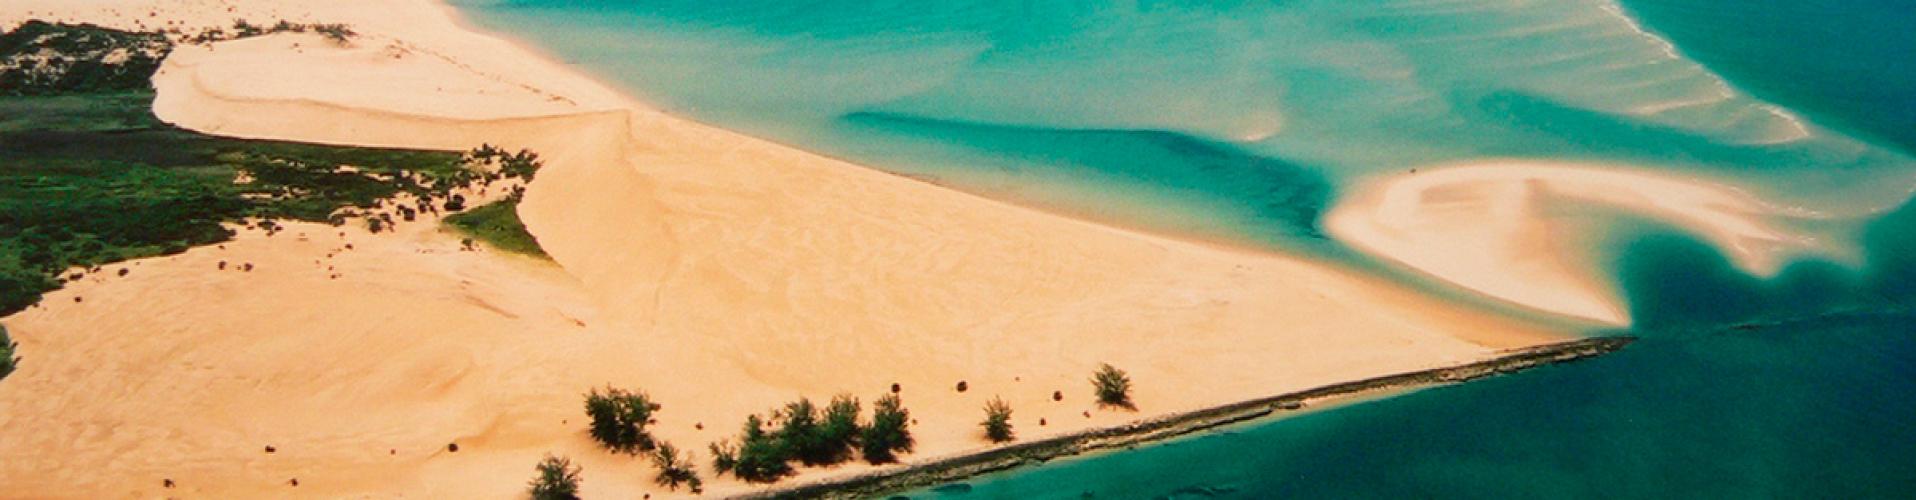 mozambique zandduinen